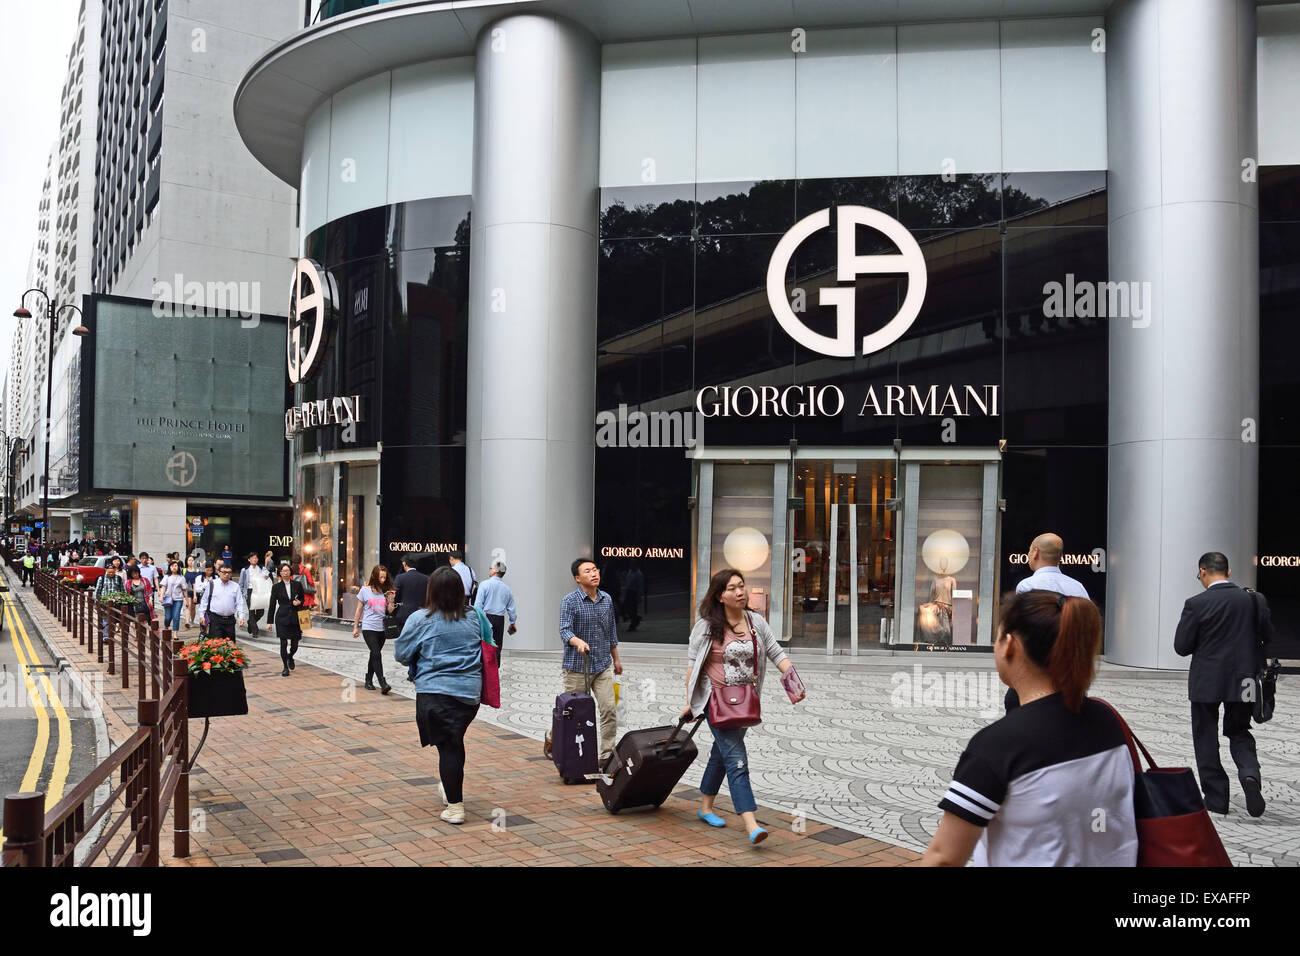 Giorgio Armani Italian Fashion Designer Italy Hong Kong Fashion Stock Photo Alamy